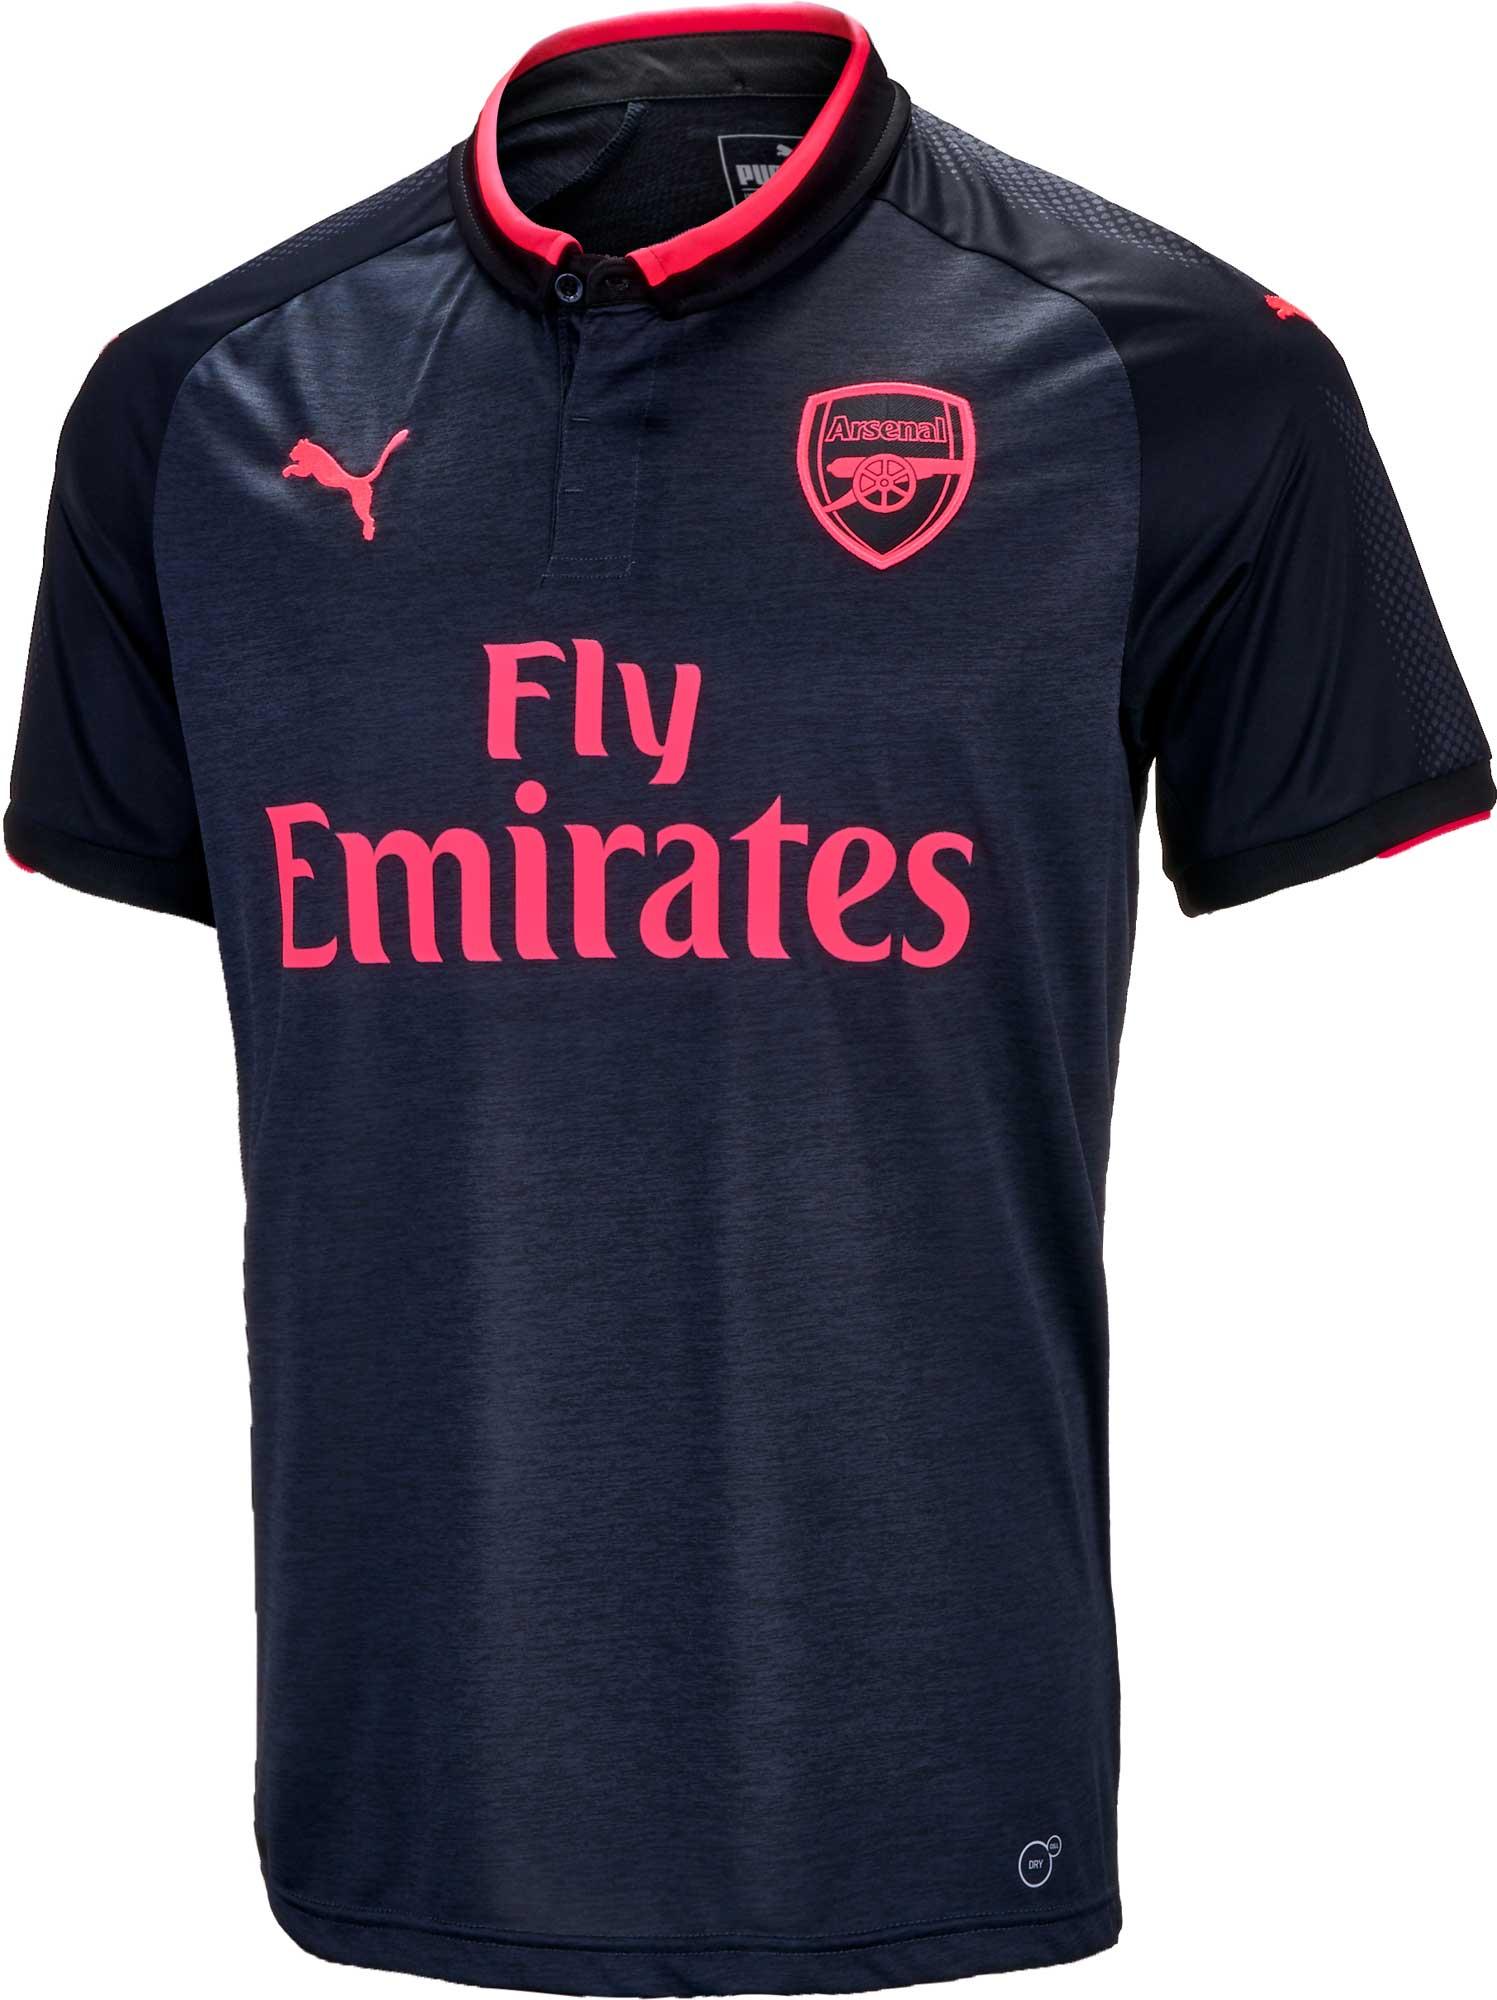 detailed look 100b8 301c9 2017/18 Kids PUMA Arsenal 3rd Jersey